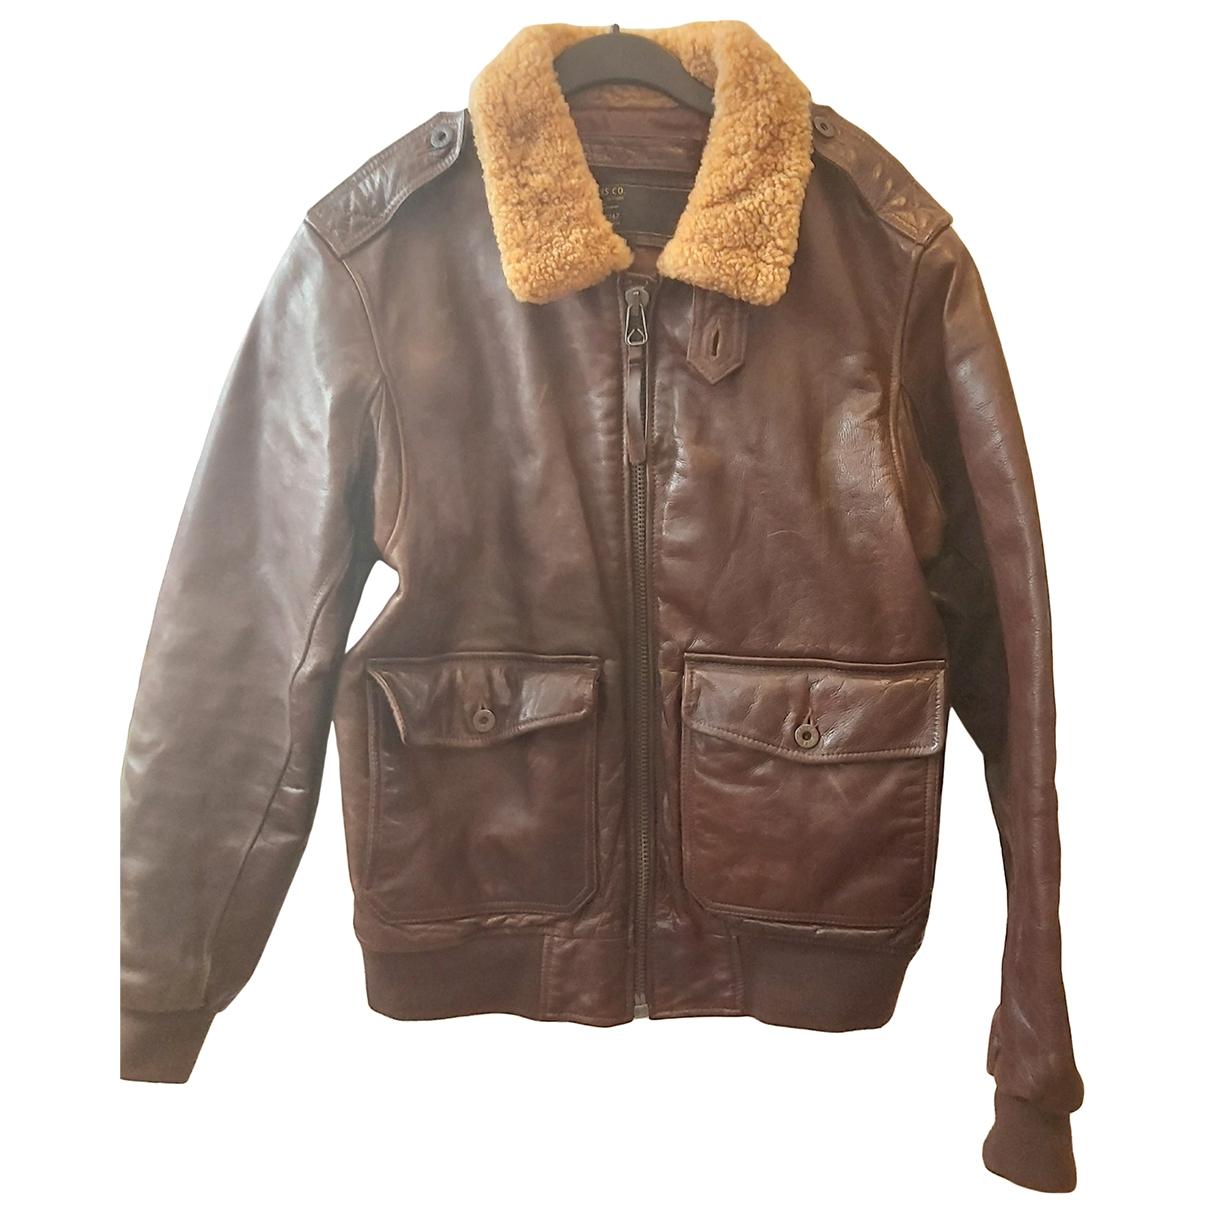 Polo Ralph Lauren \N Brown Leather jacket  for Men M International